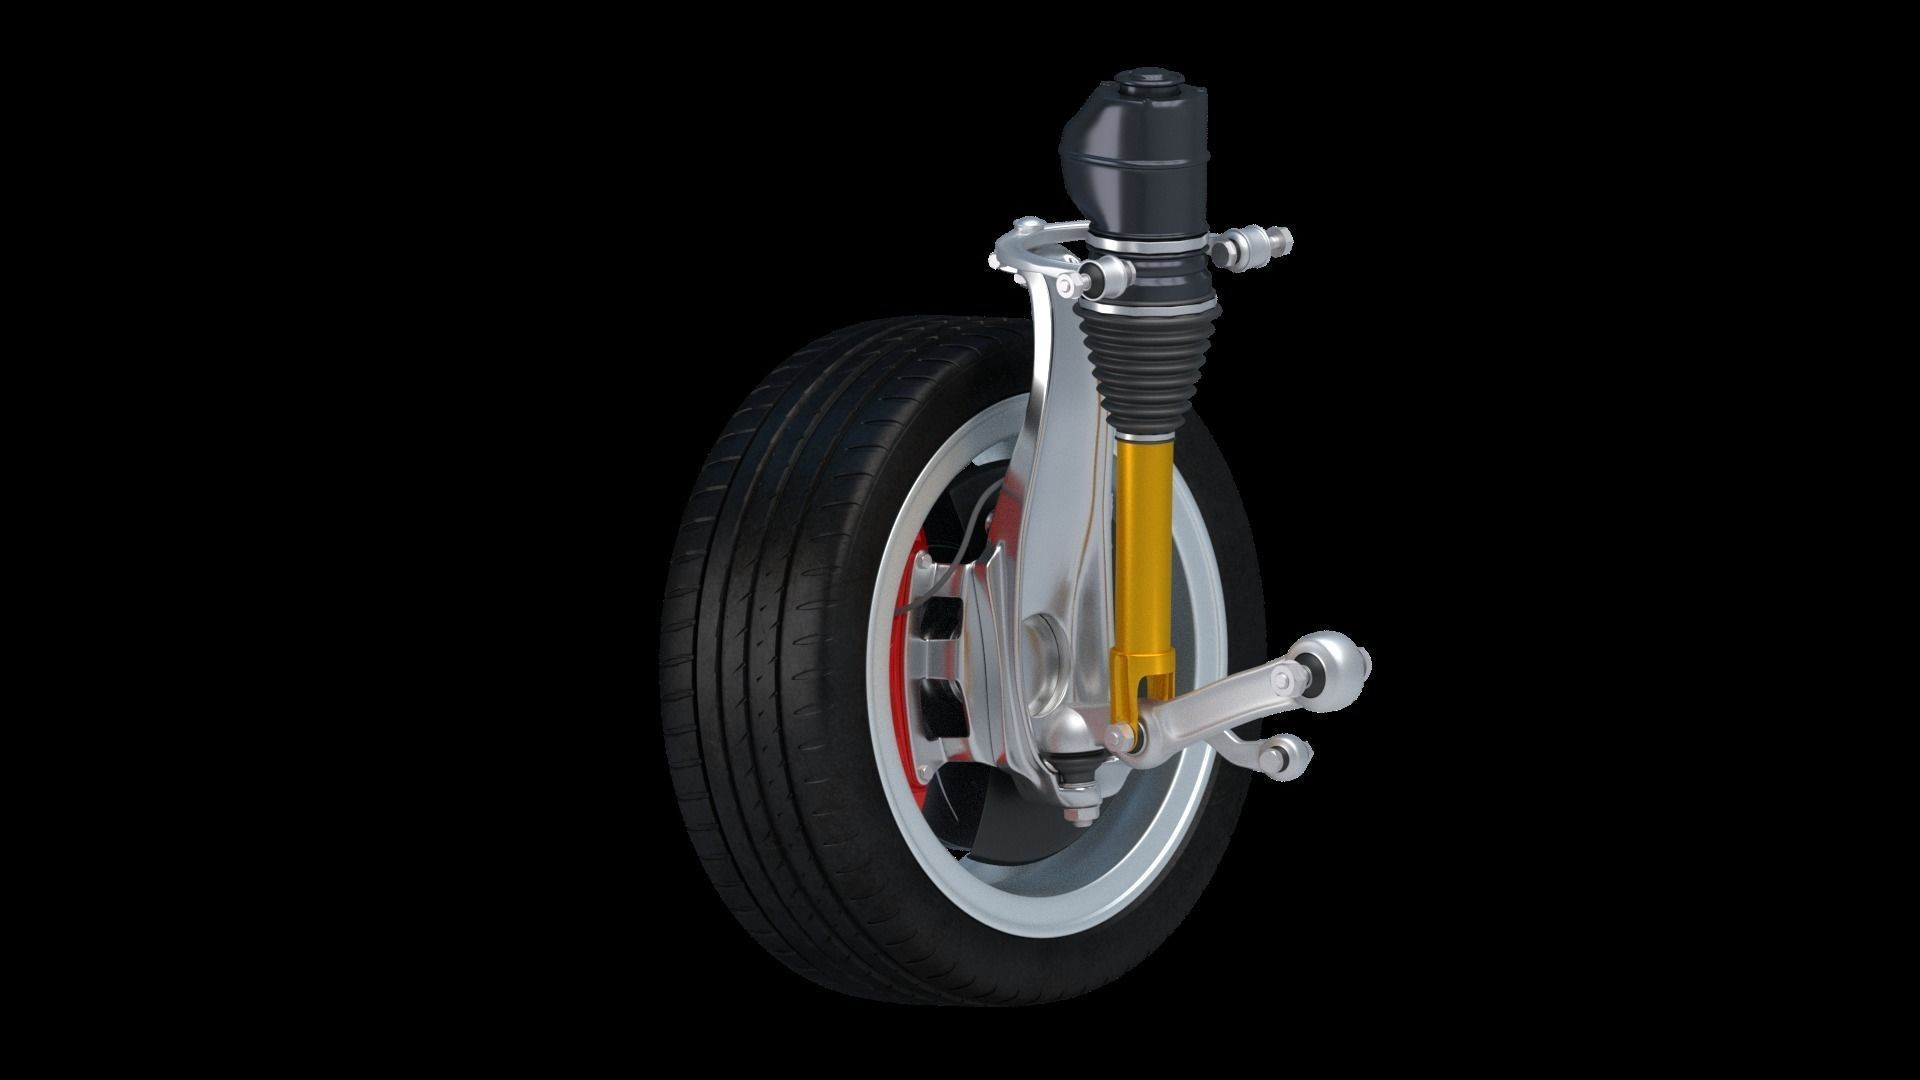 Car Wheel Lexus part 3D